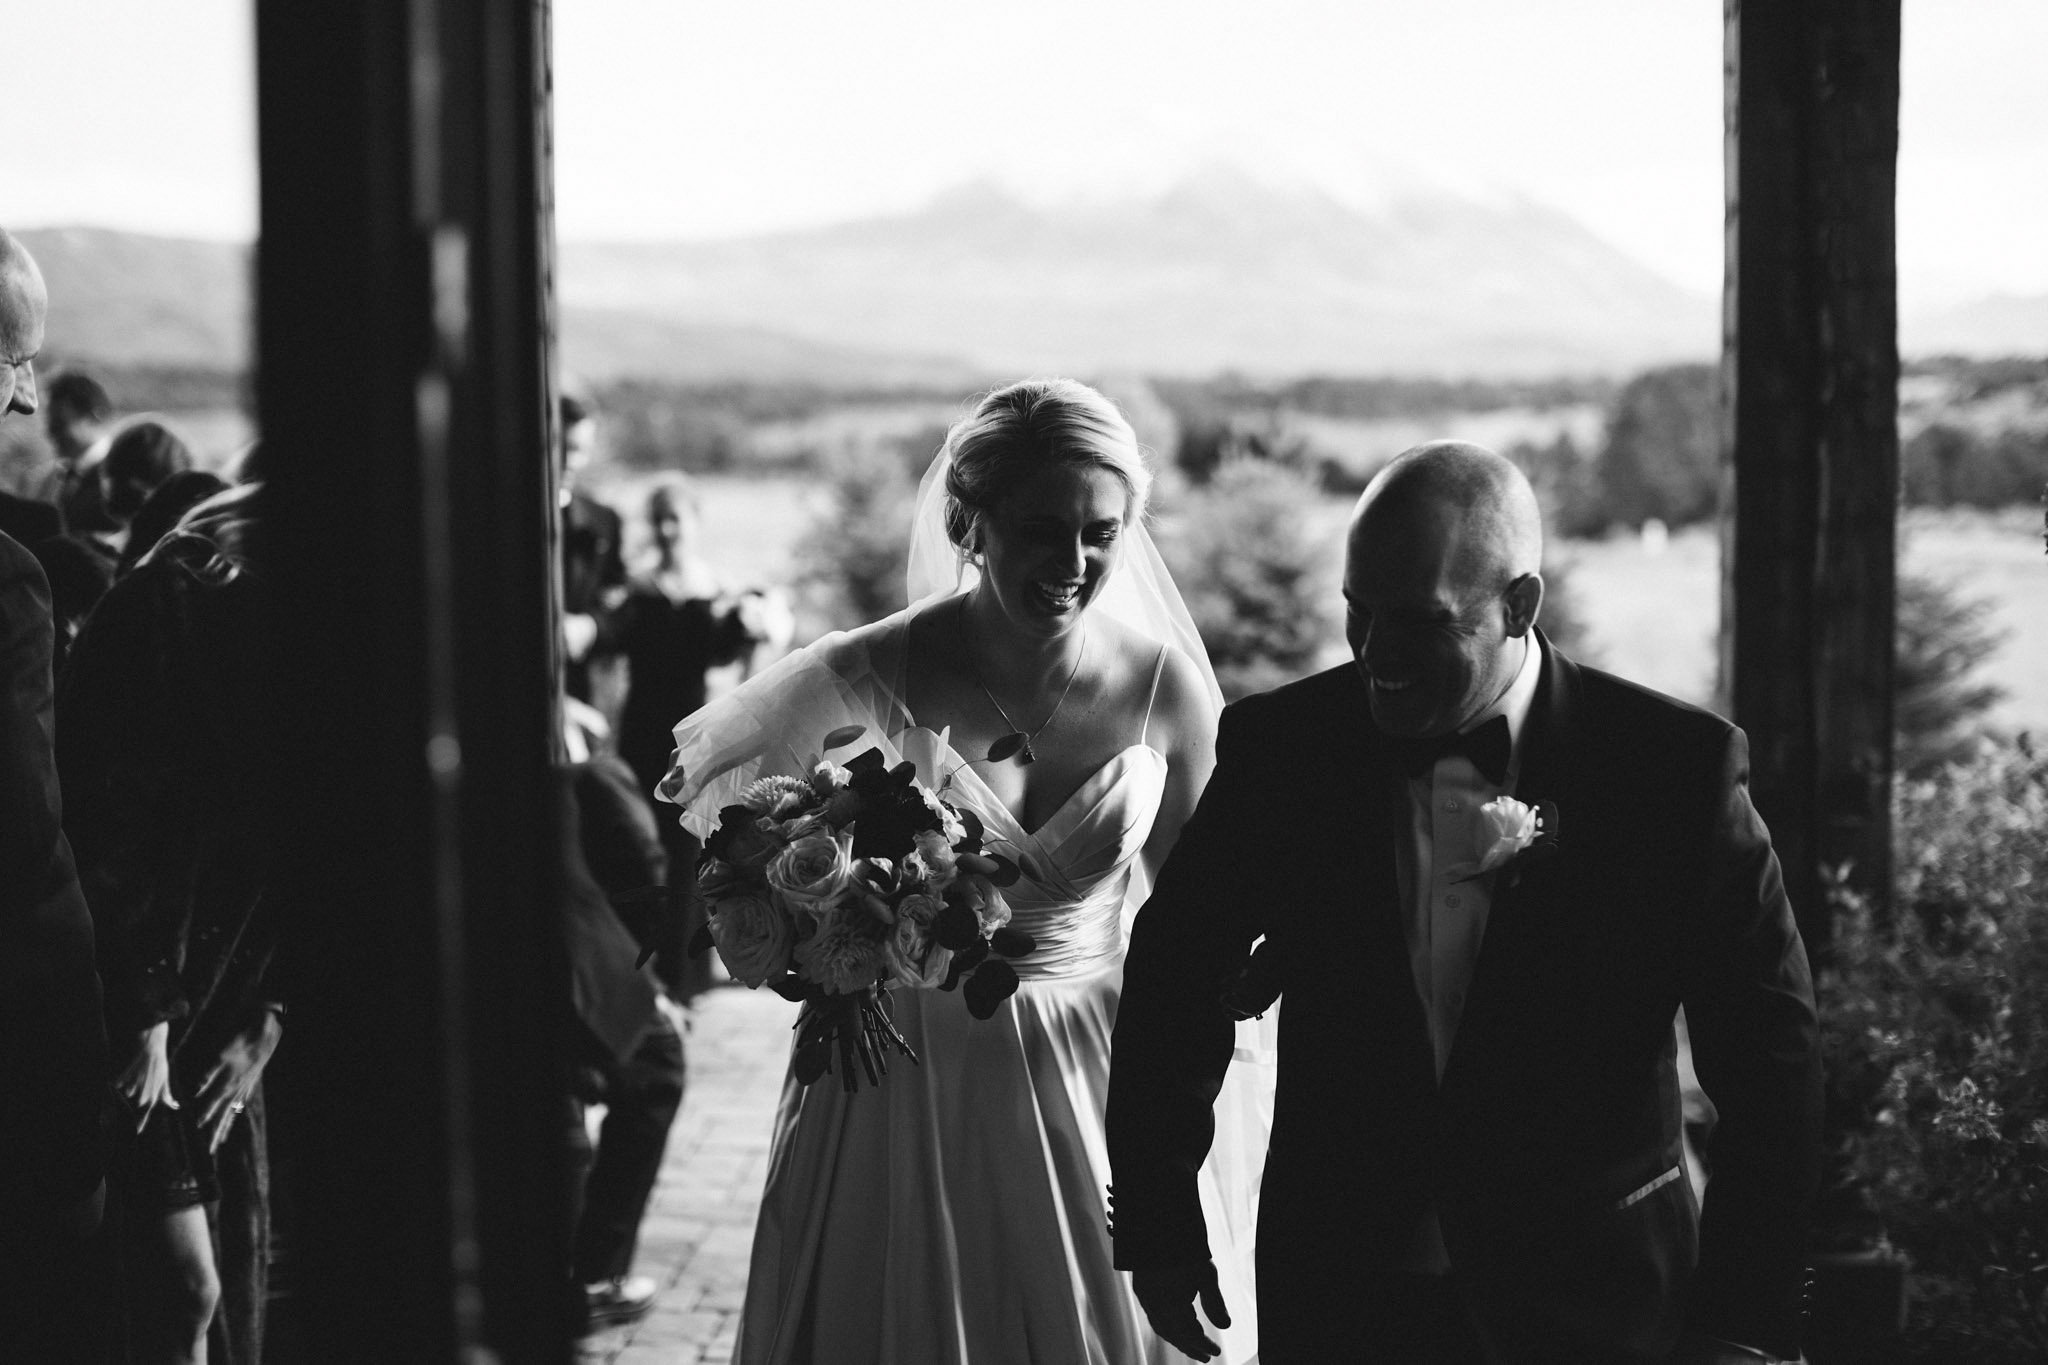 04Aspen Colorado Wedding_Kindling Wedding Photography_17.JPG